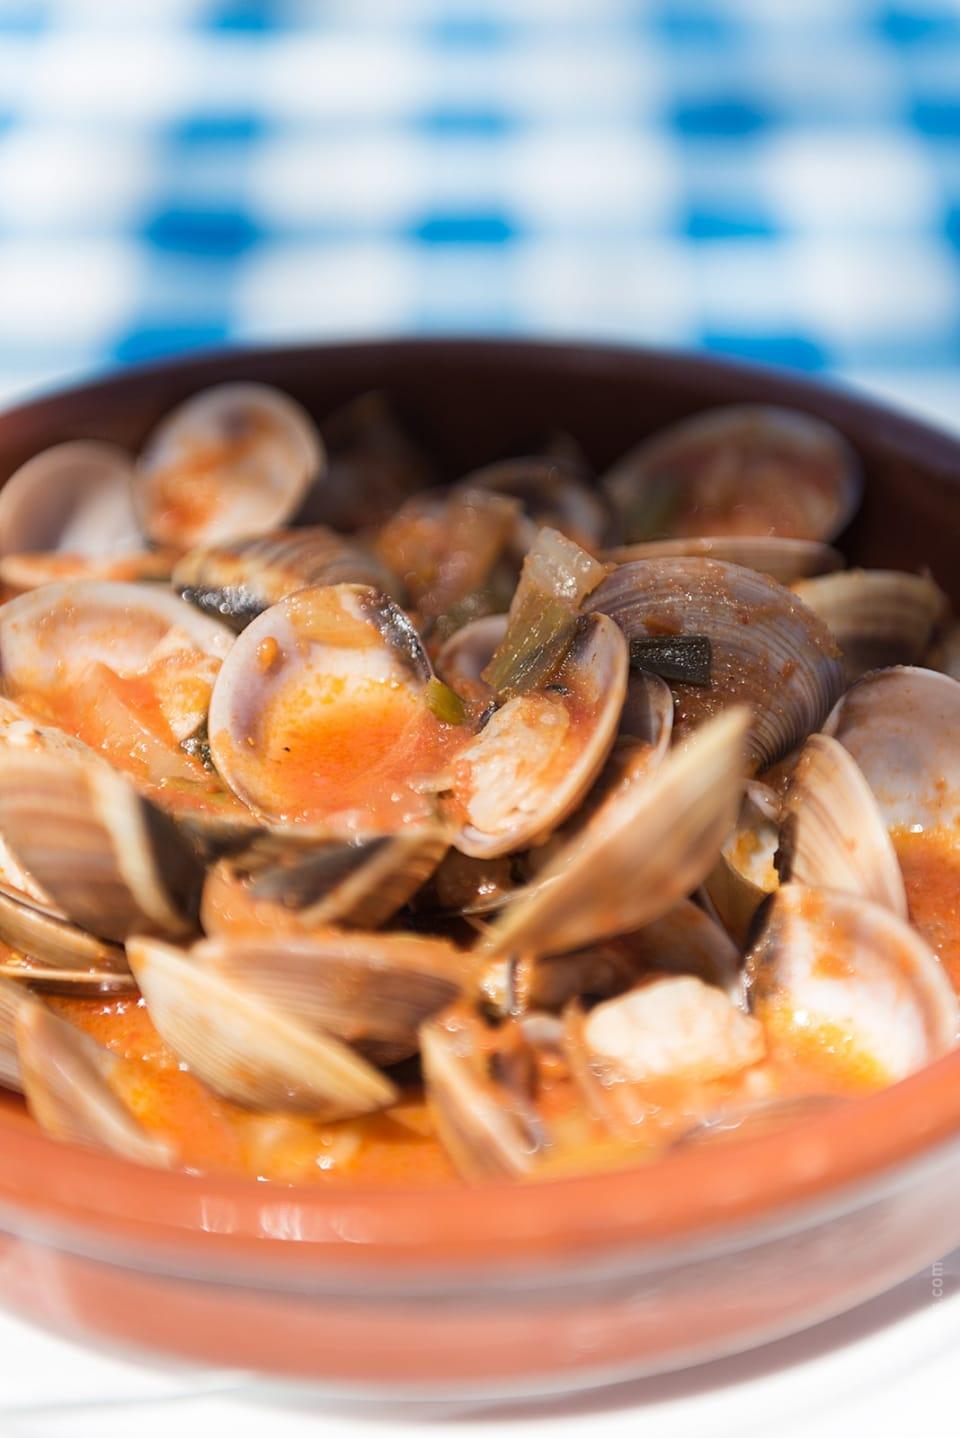 20140504 9816 960x1438 - Lunch at Illeta, Camp de Mar